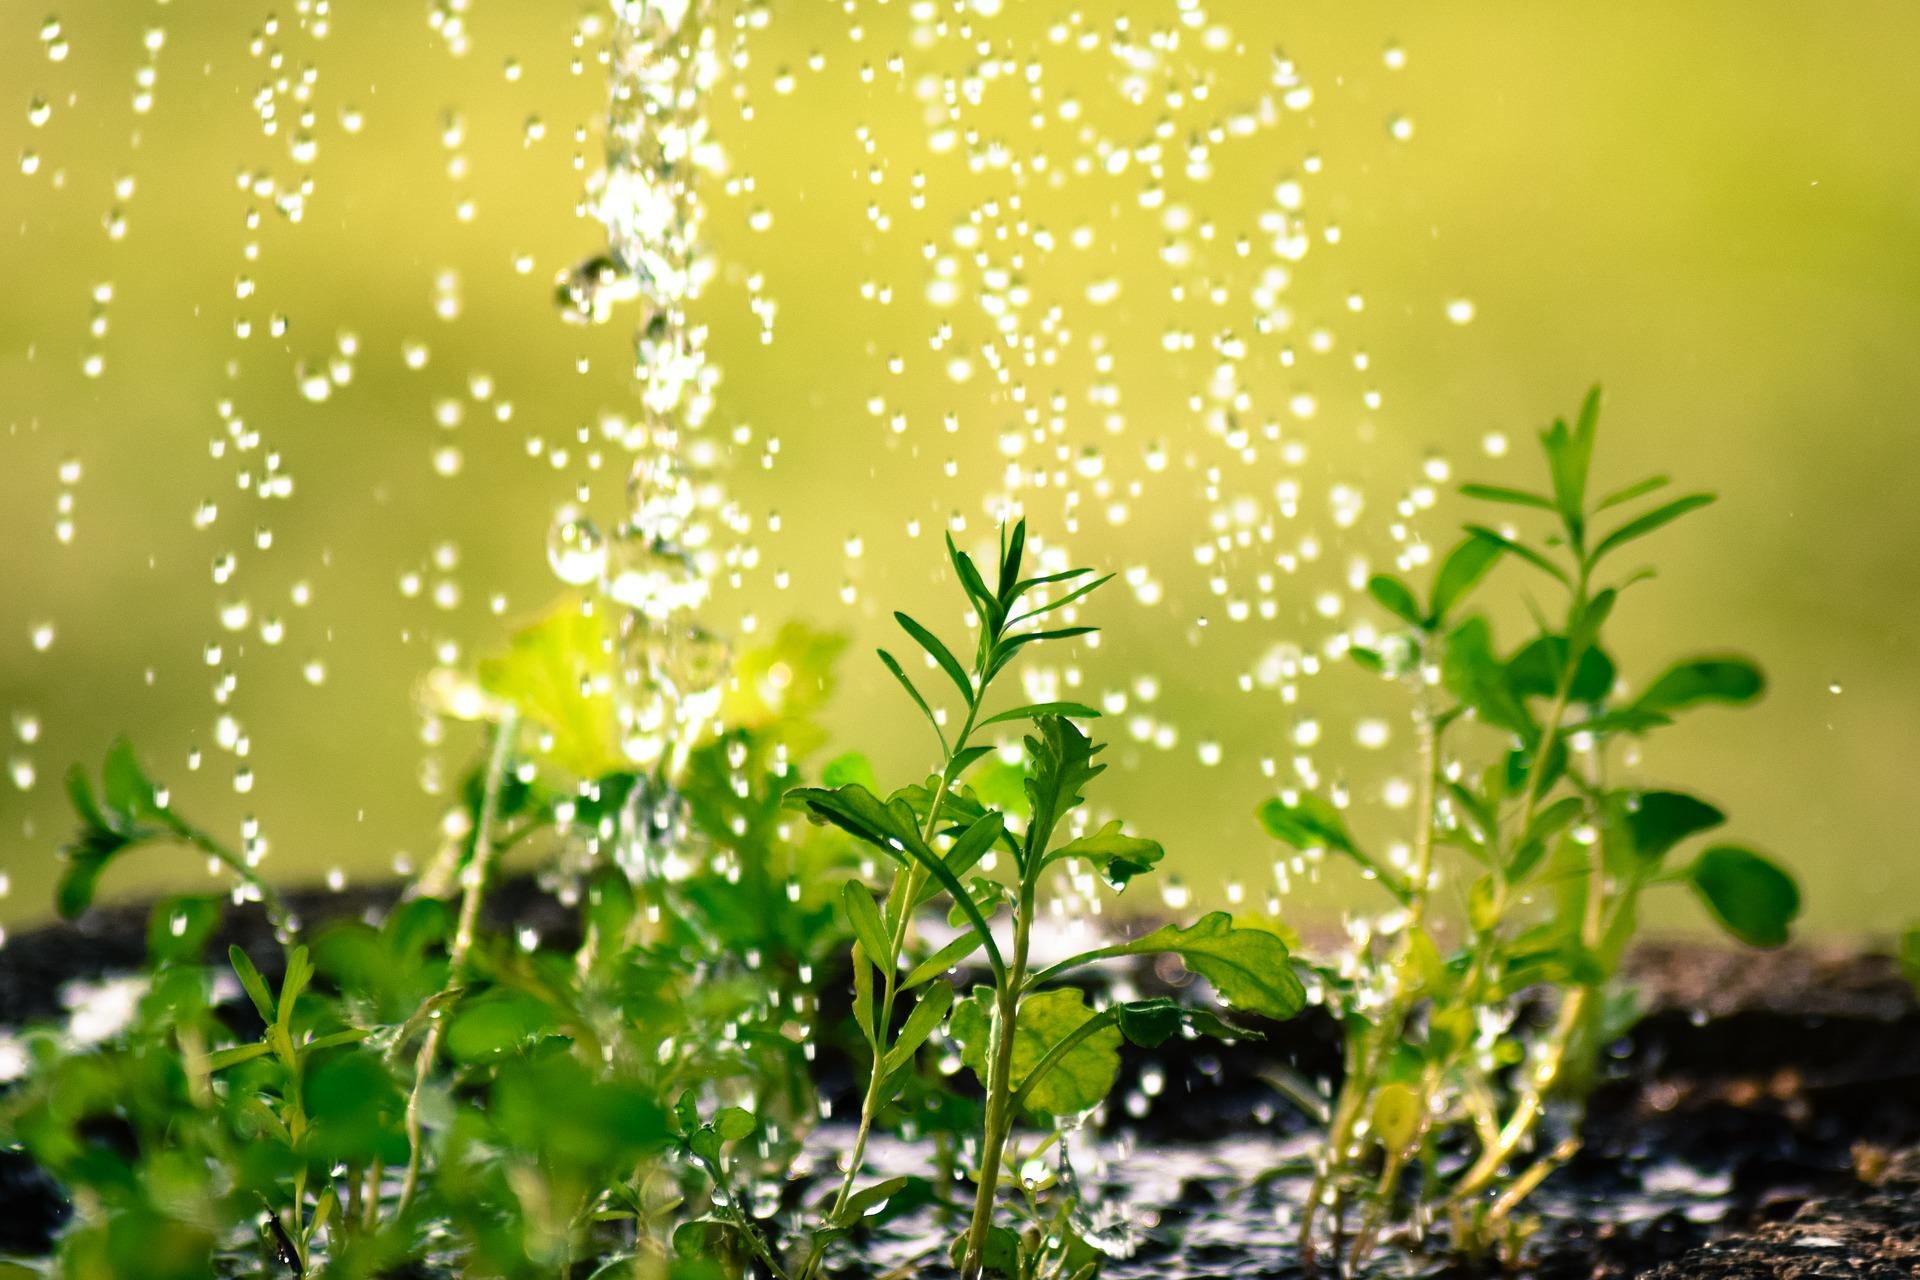 Gardening for Rainy Days